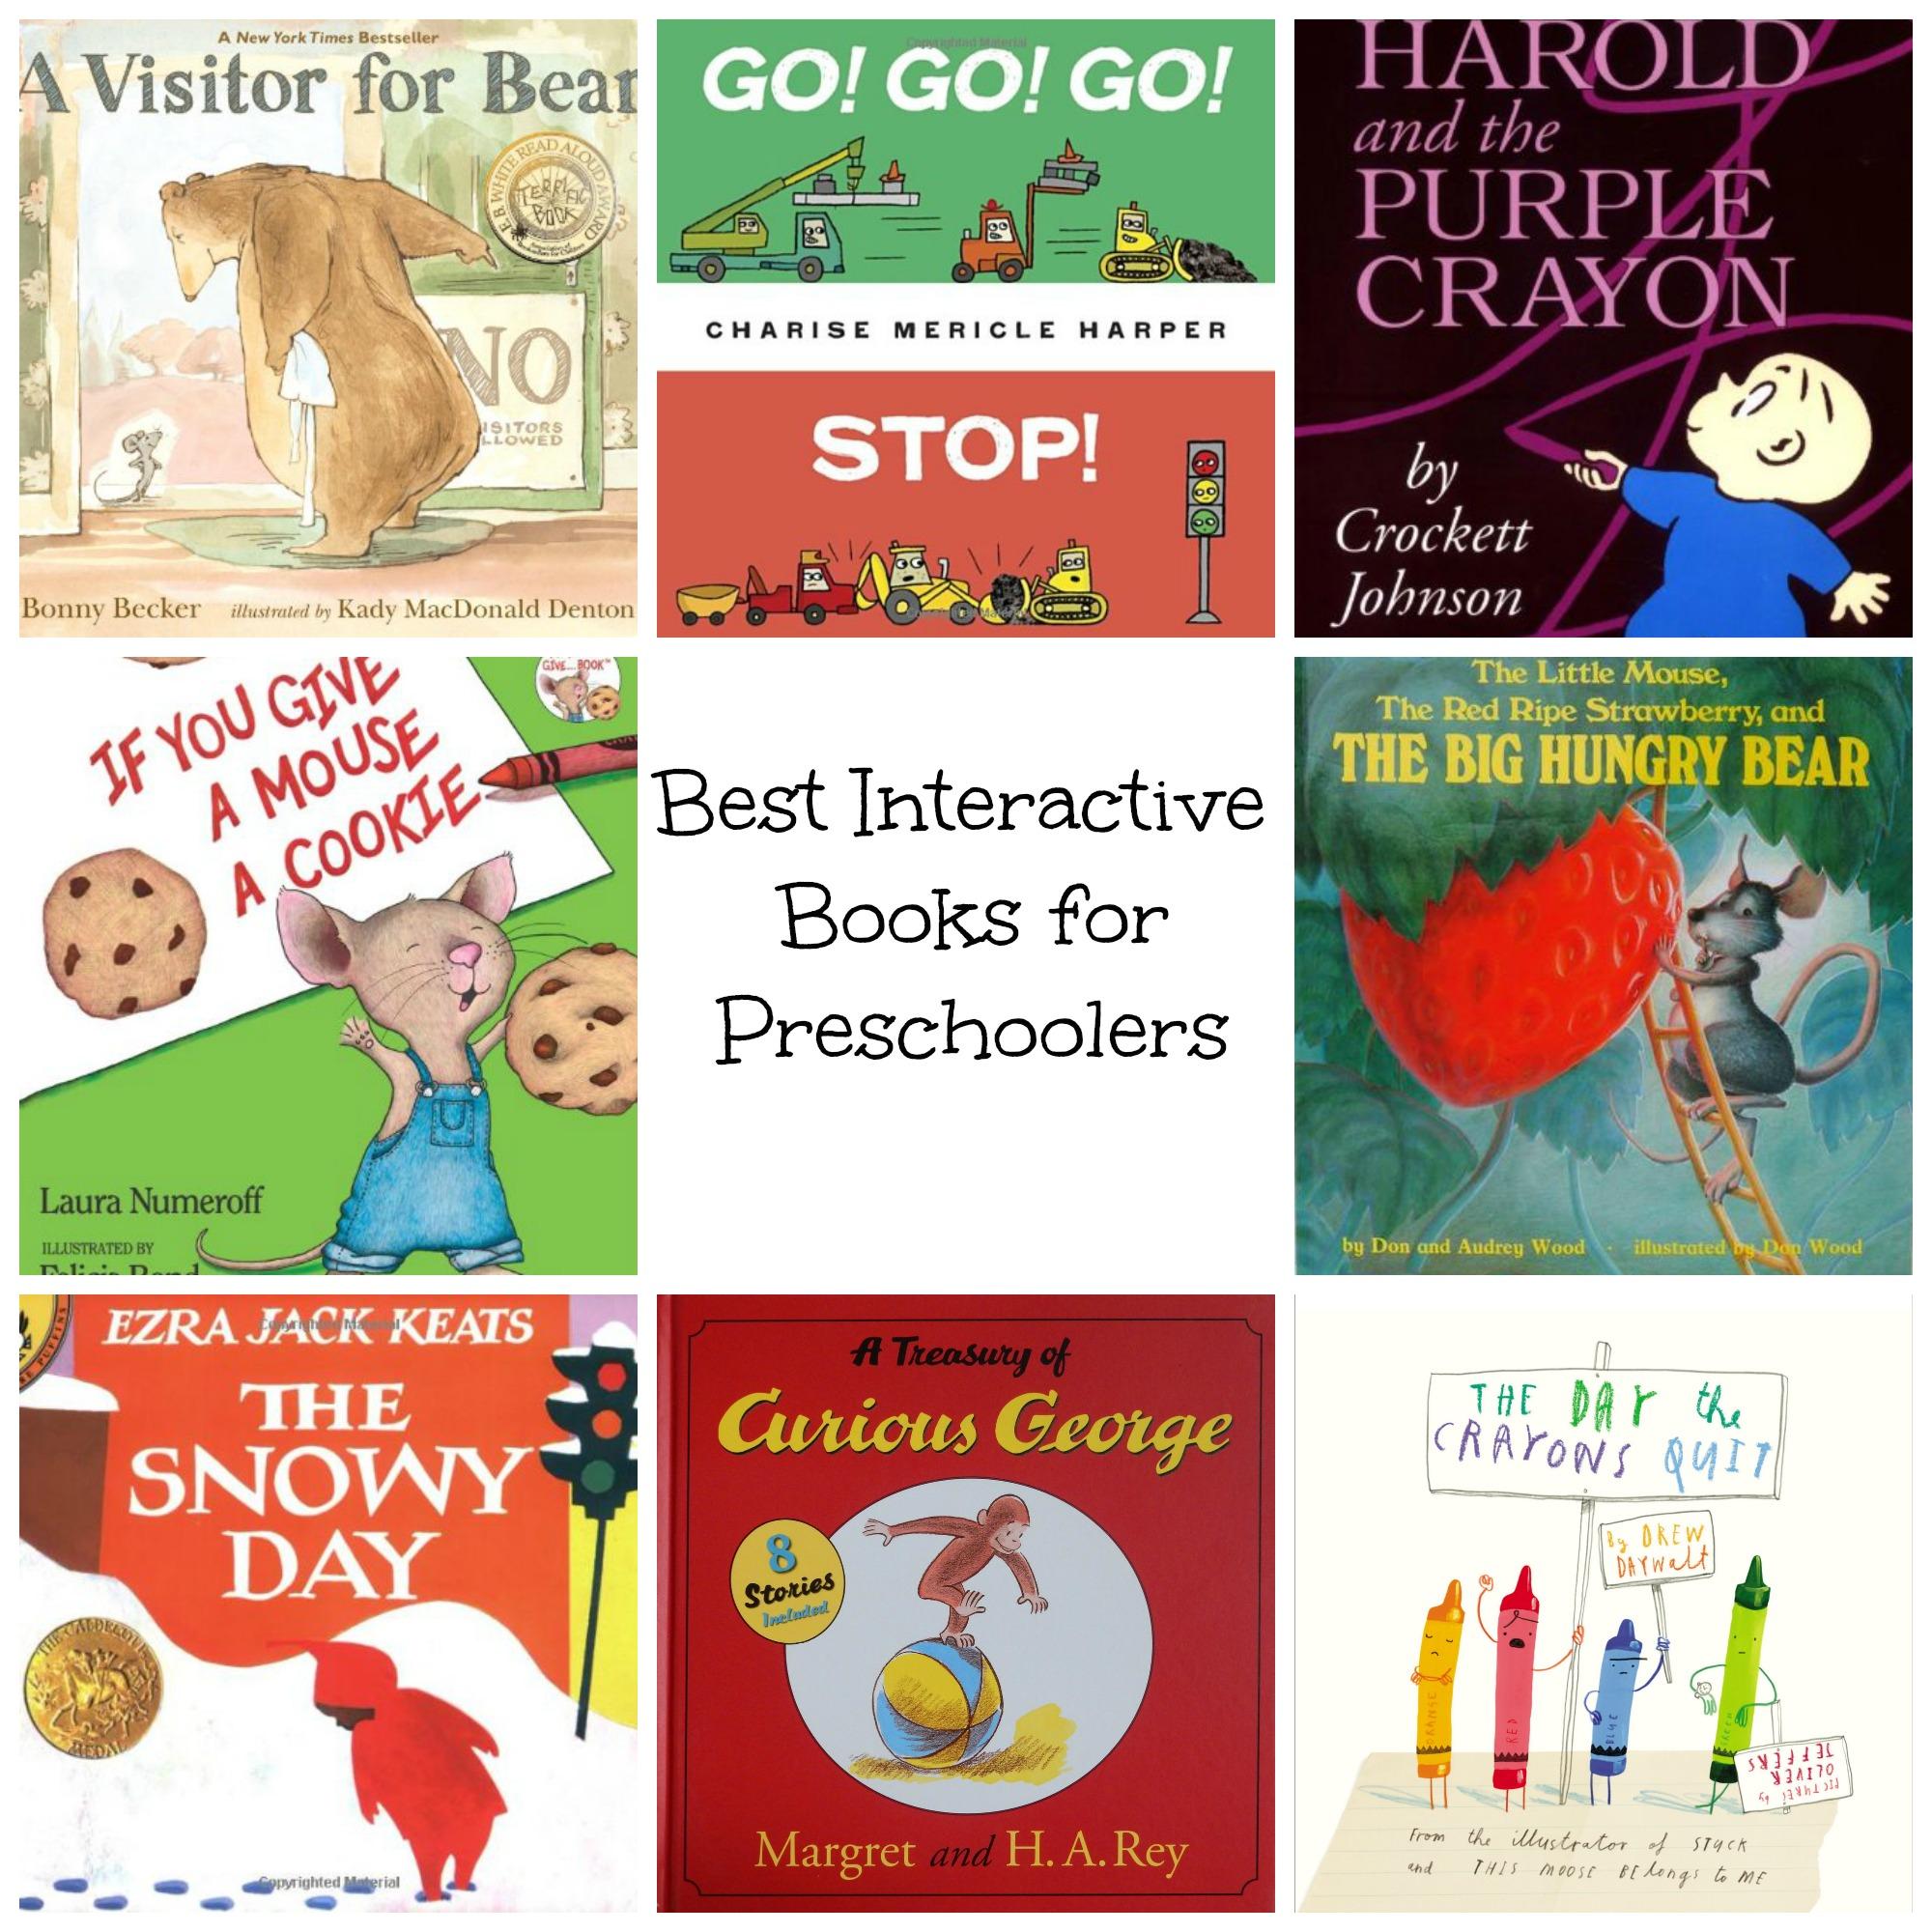 best books for preschoolers best interactive books for preschoolers nurture and thrive 100